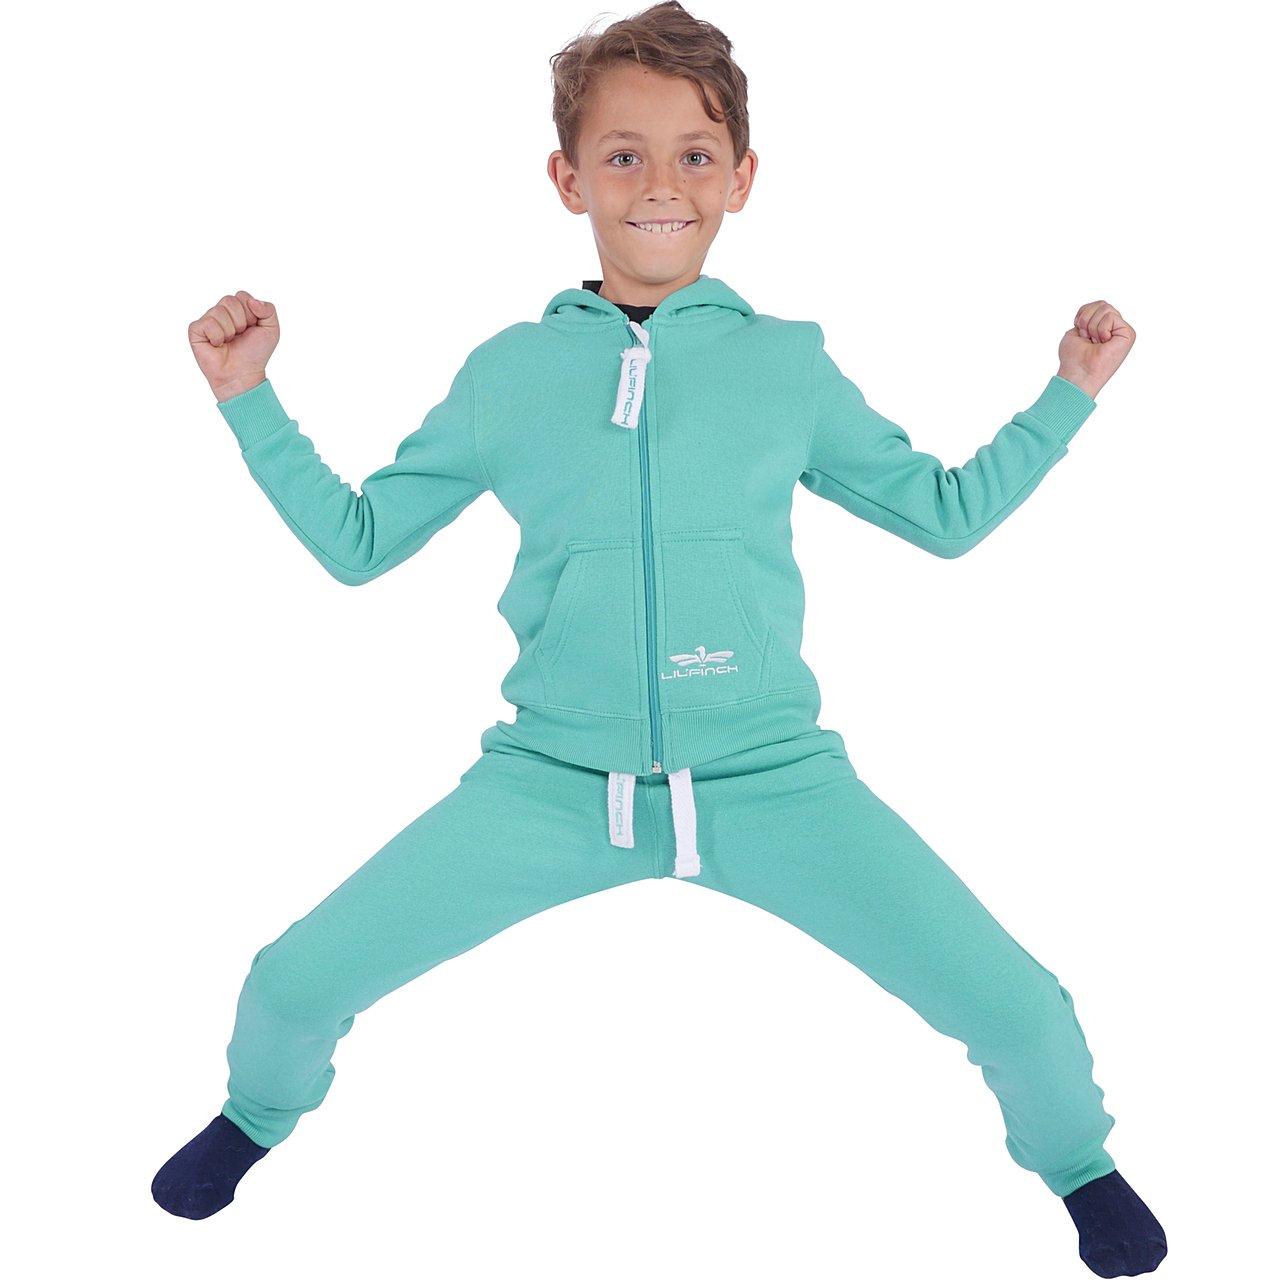 LIL'Finch Kinder Trainingsanzug Jungen Mädchen Kids Schlafanzug Jogger Anzug